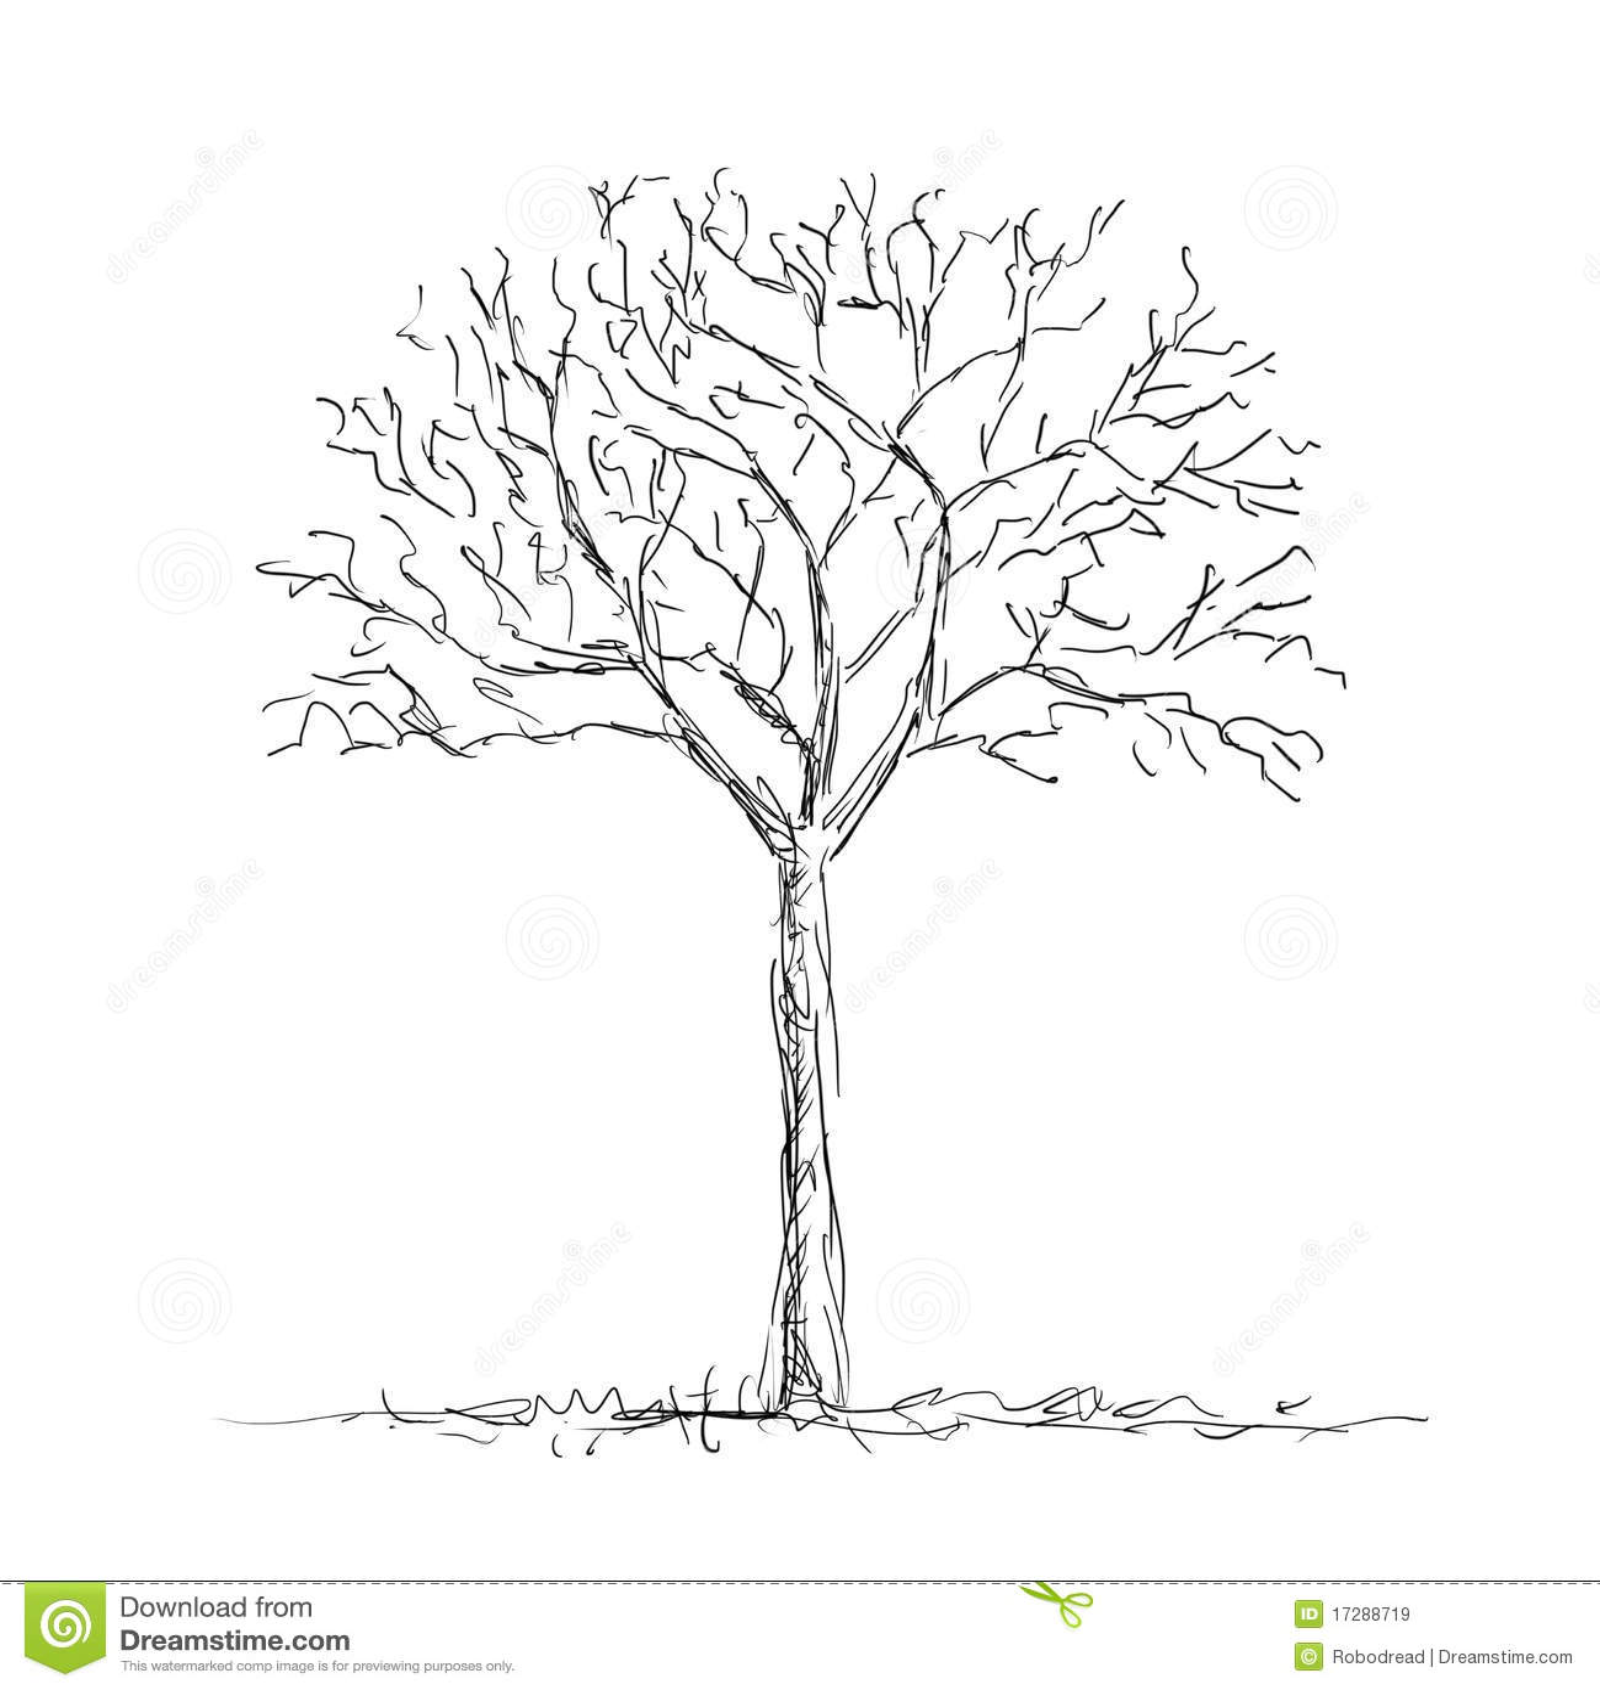 Bare tree stock illustration. Illustration of black ...